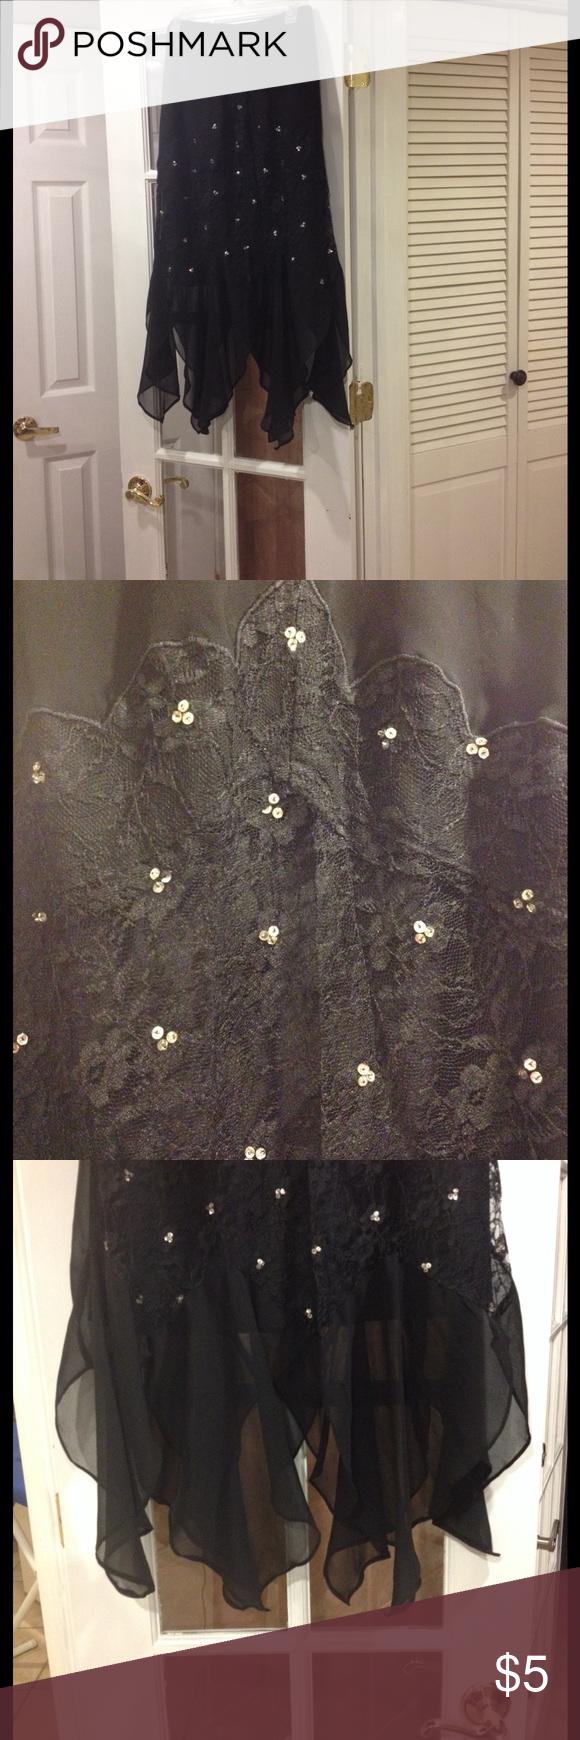 Medium 8-10) Paradise NY skirt good condition Medium (8-10) Paradise NY skirt good condition Paradise NY Skirts